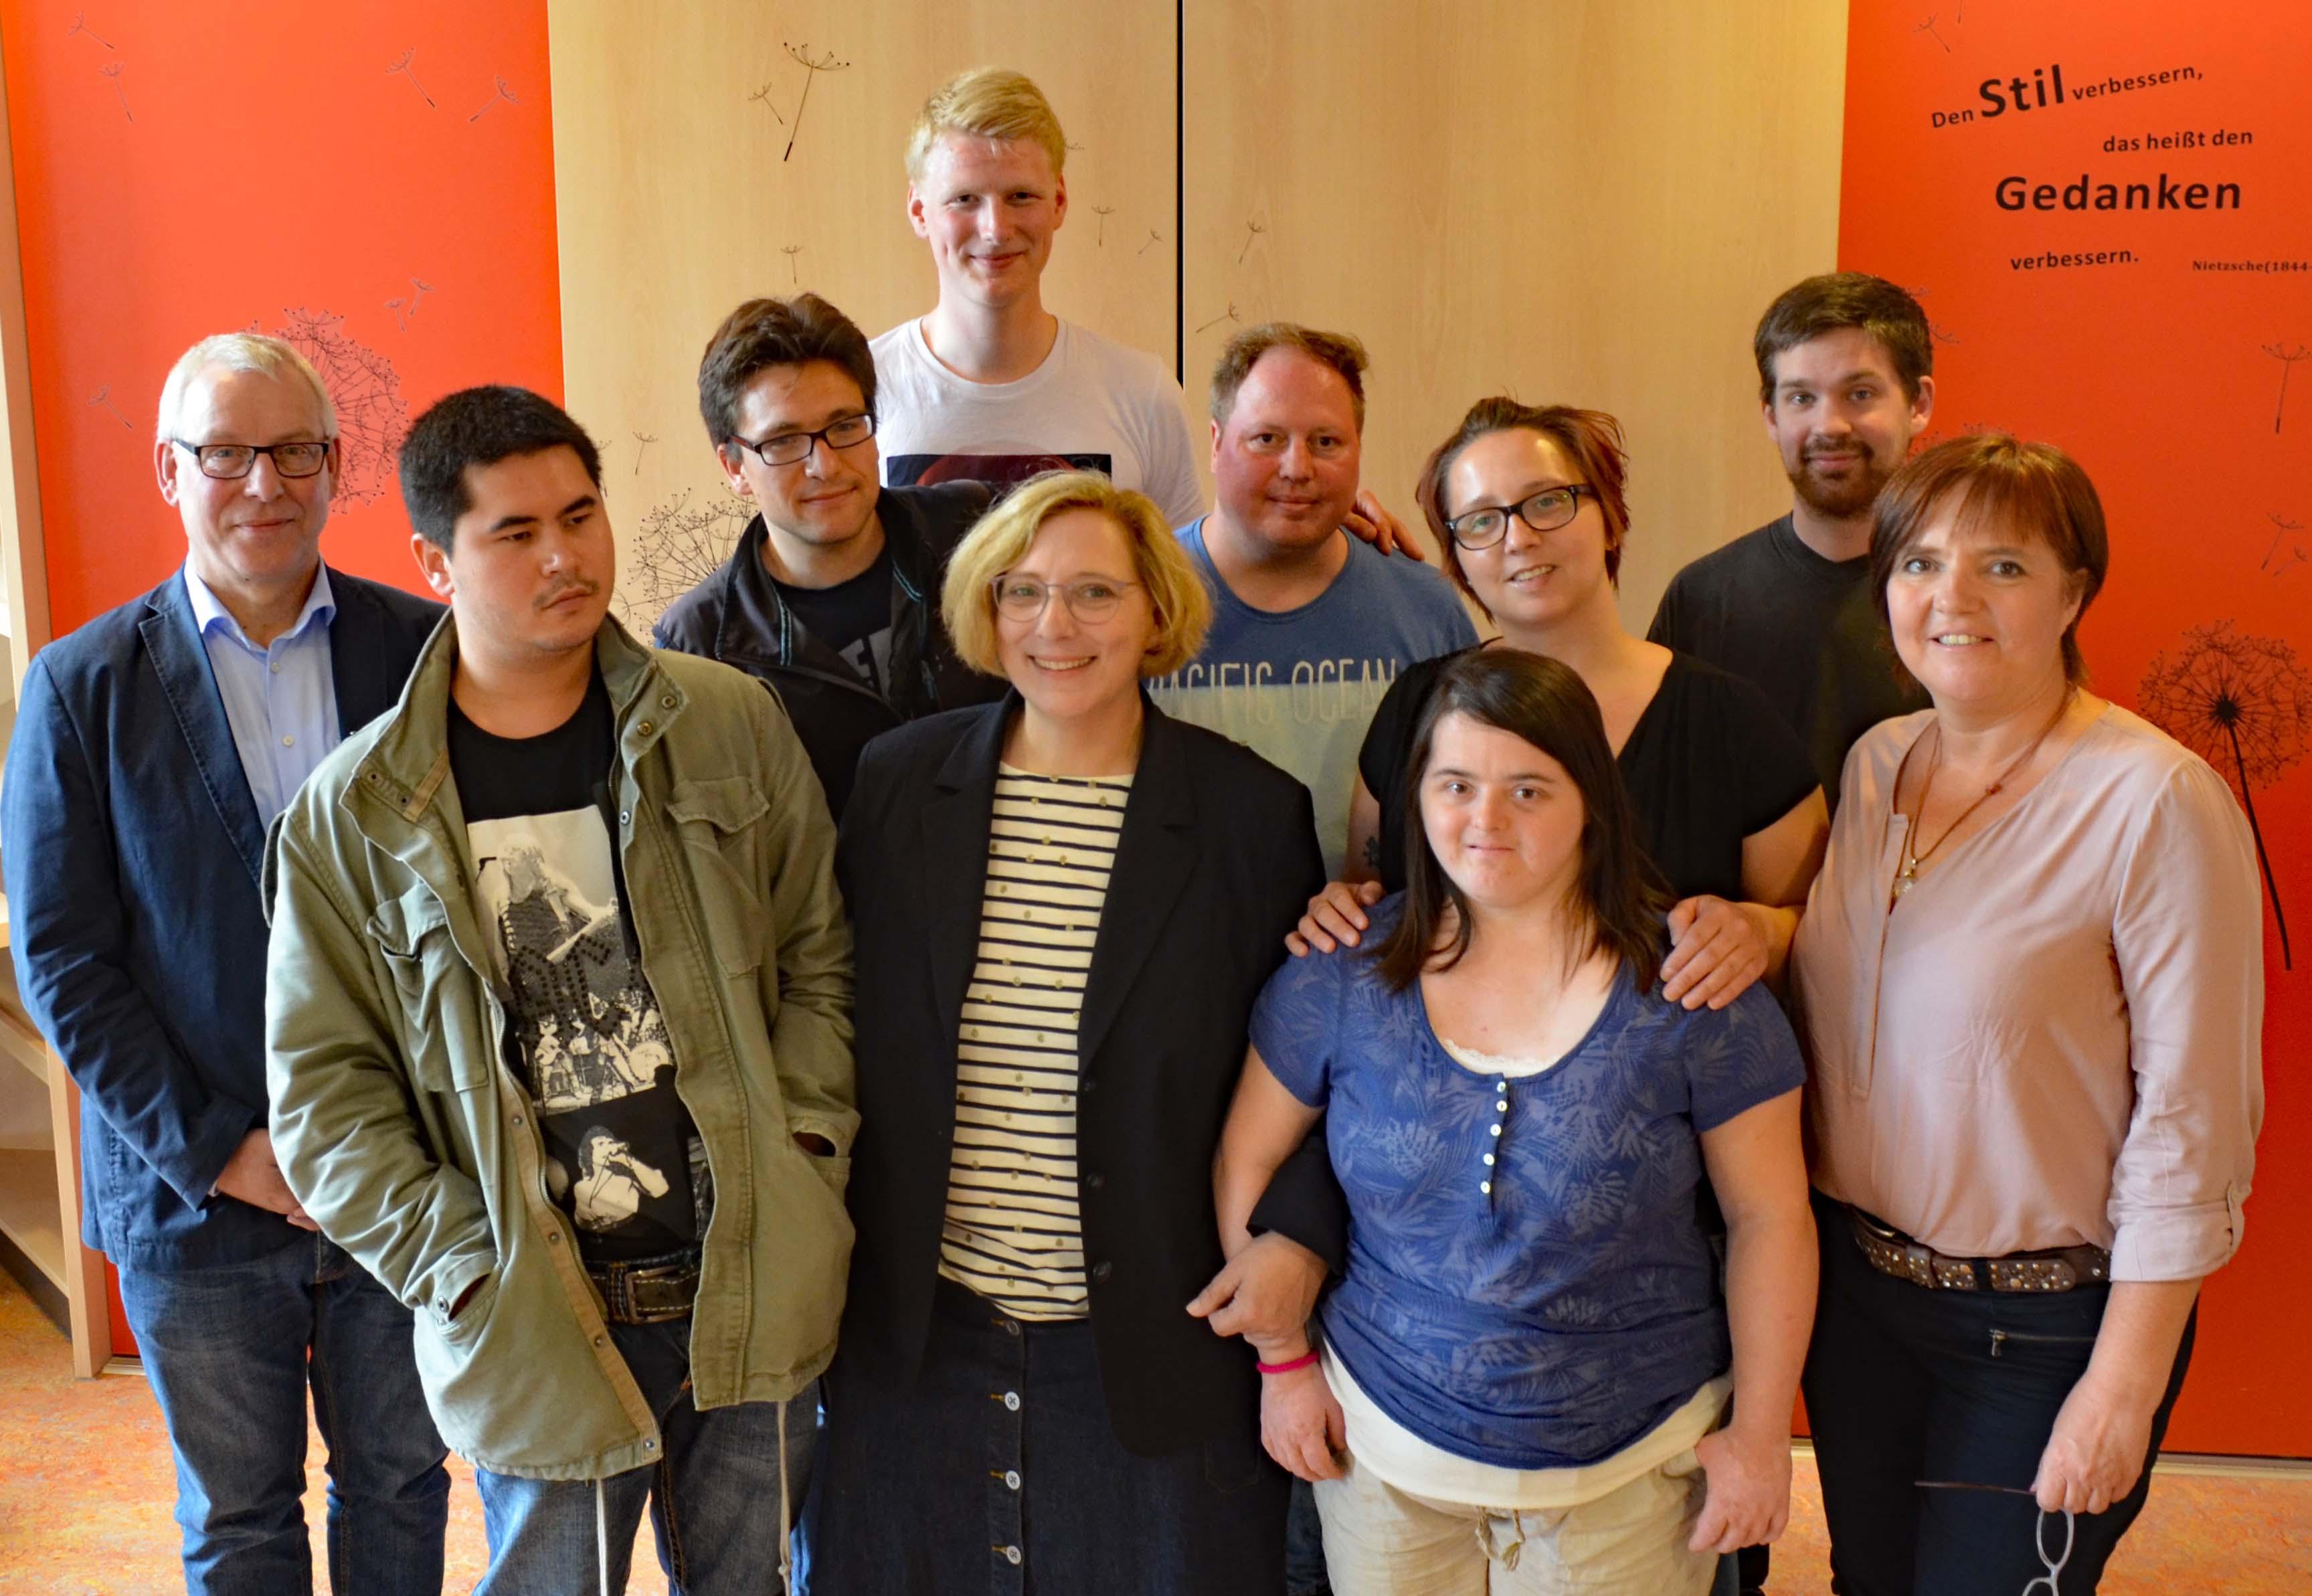 Dr. Daniela De Ridder besucht das 'KommIn' in Nordhorn